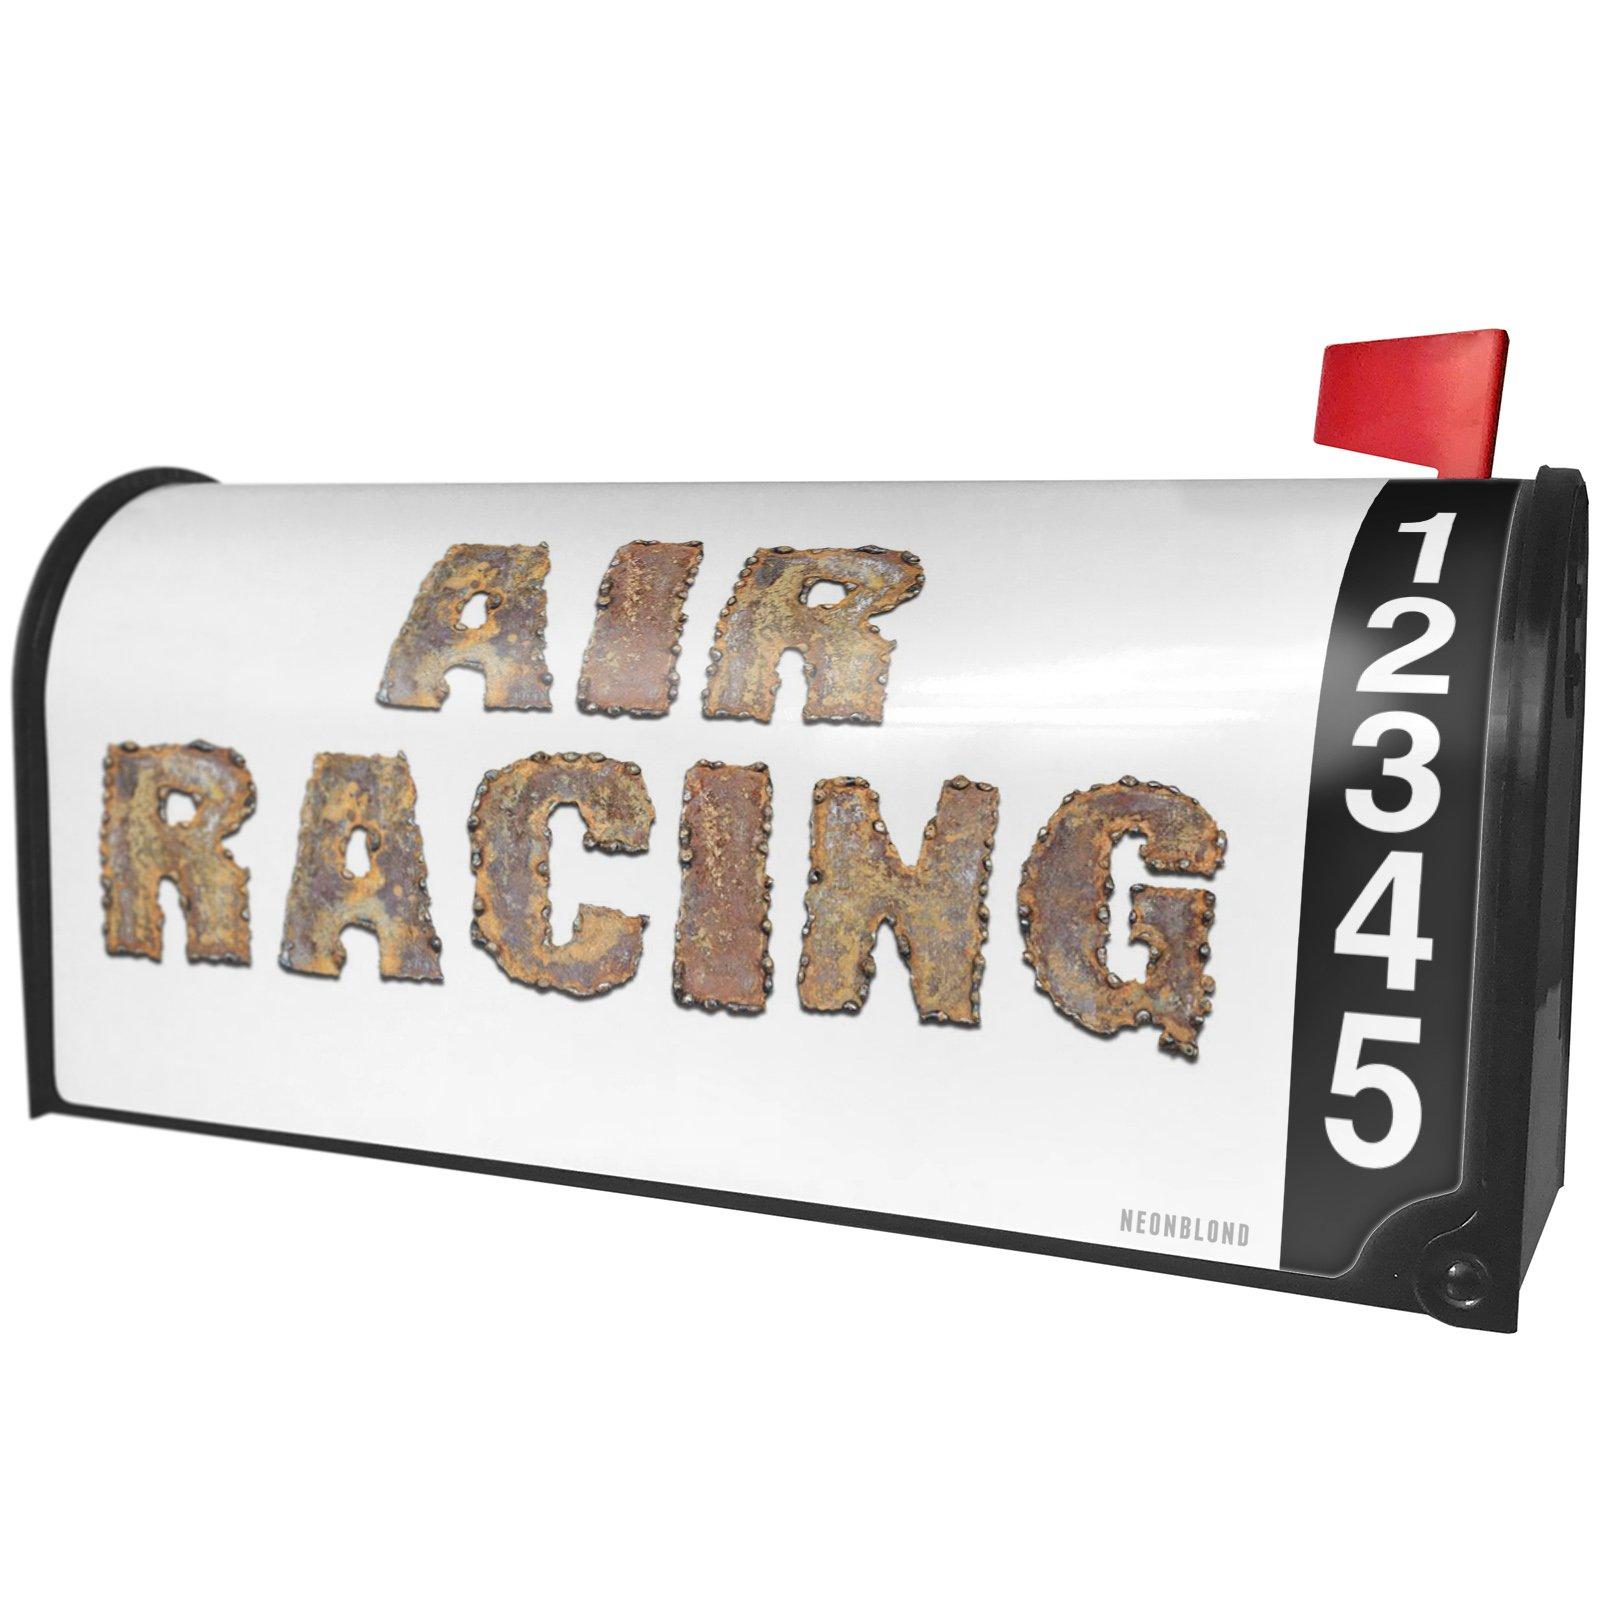 NEONBLOND Air Racing Rusty Vintage Metal Welding Magnetic Mailbox Cover Custom Numbers